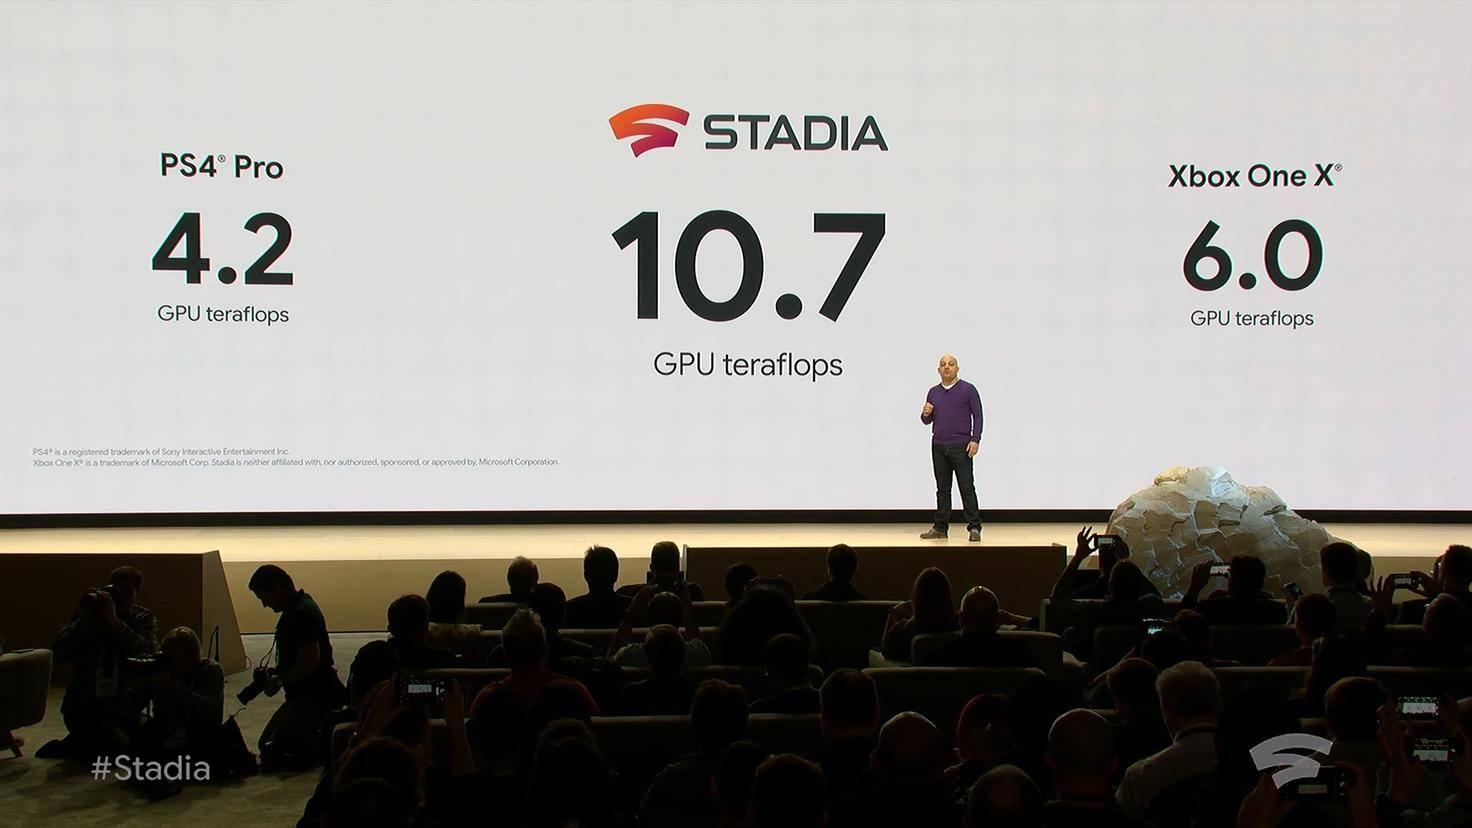 google-stadia-vs-ps4-xbox-one